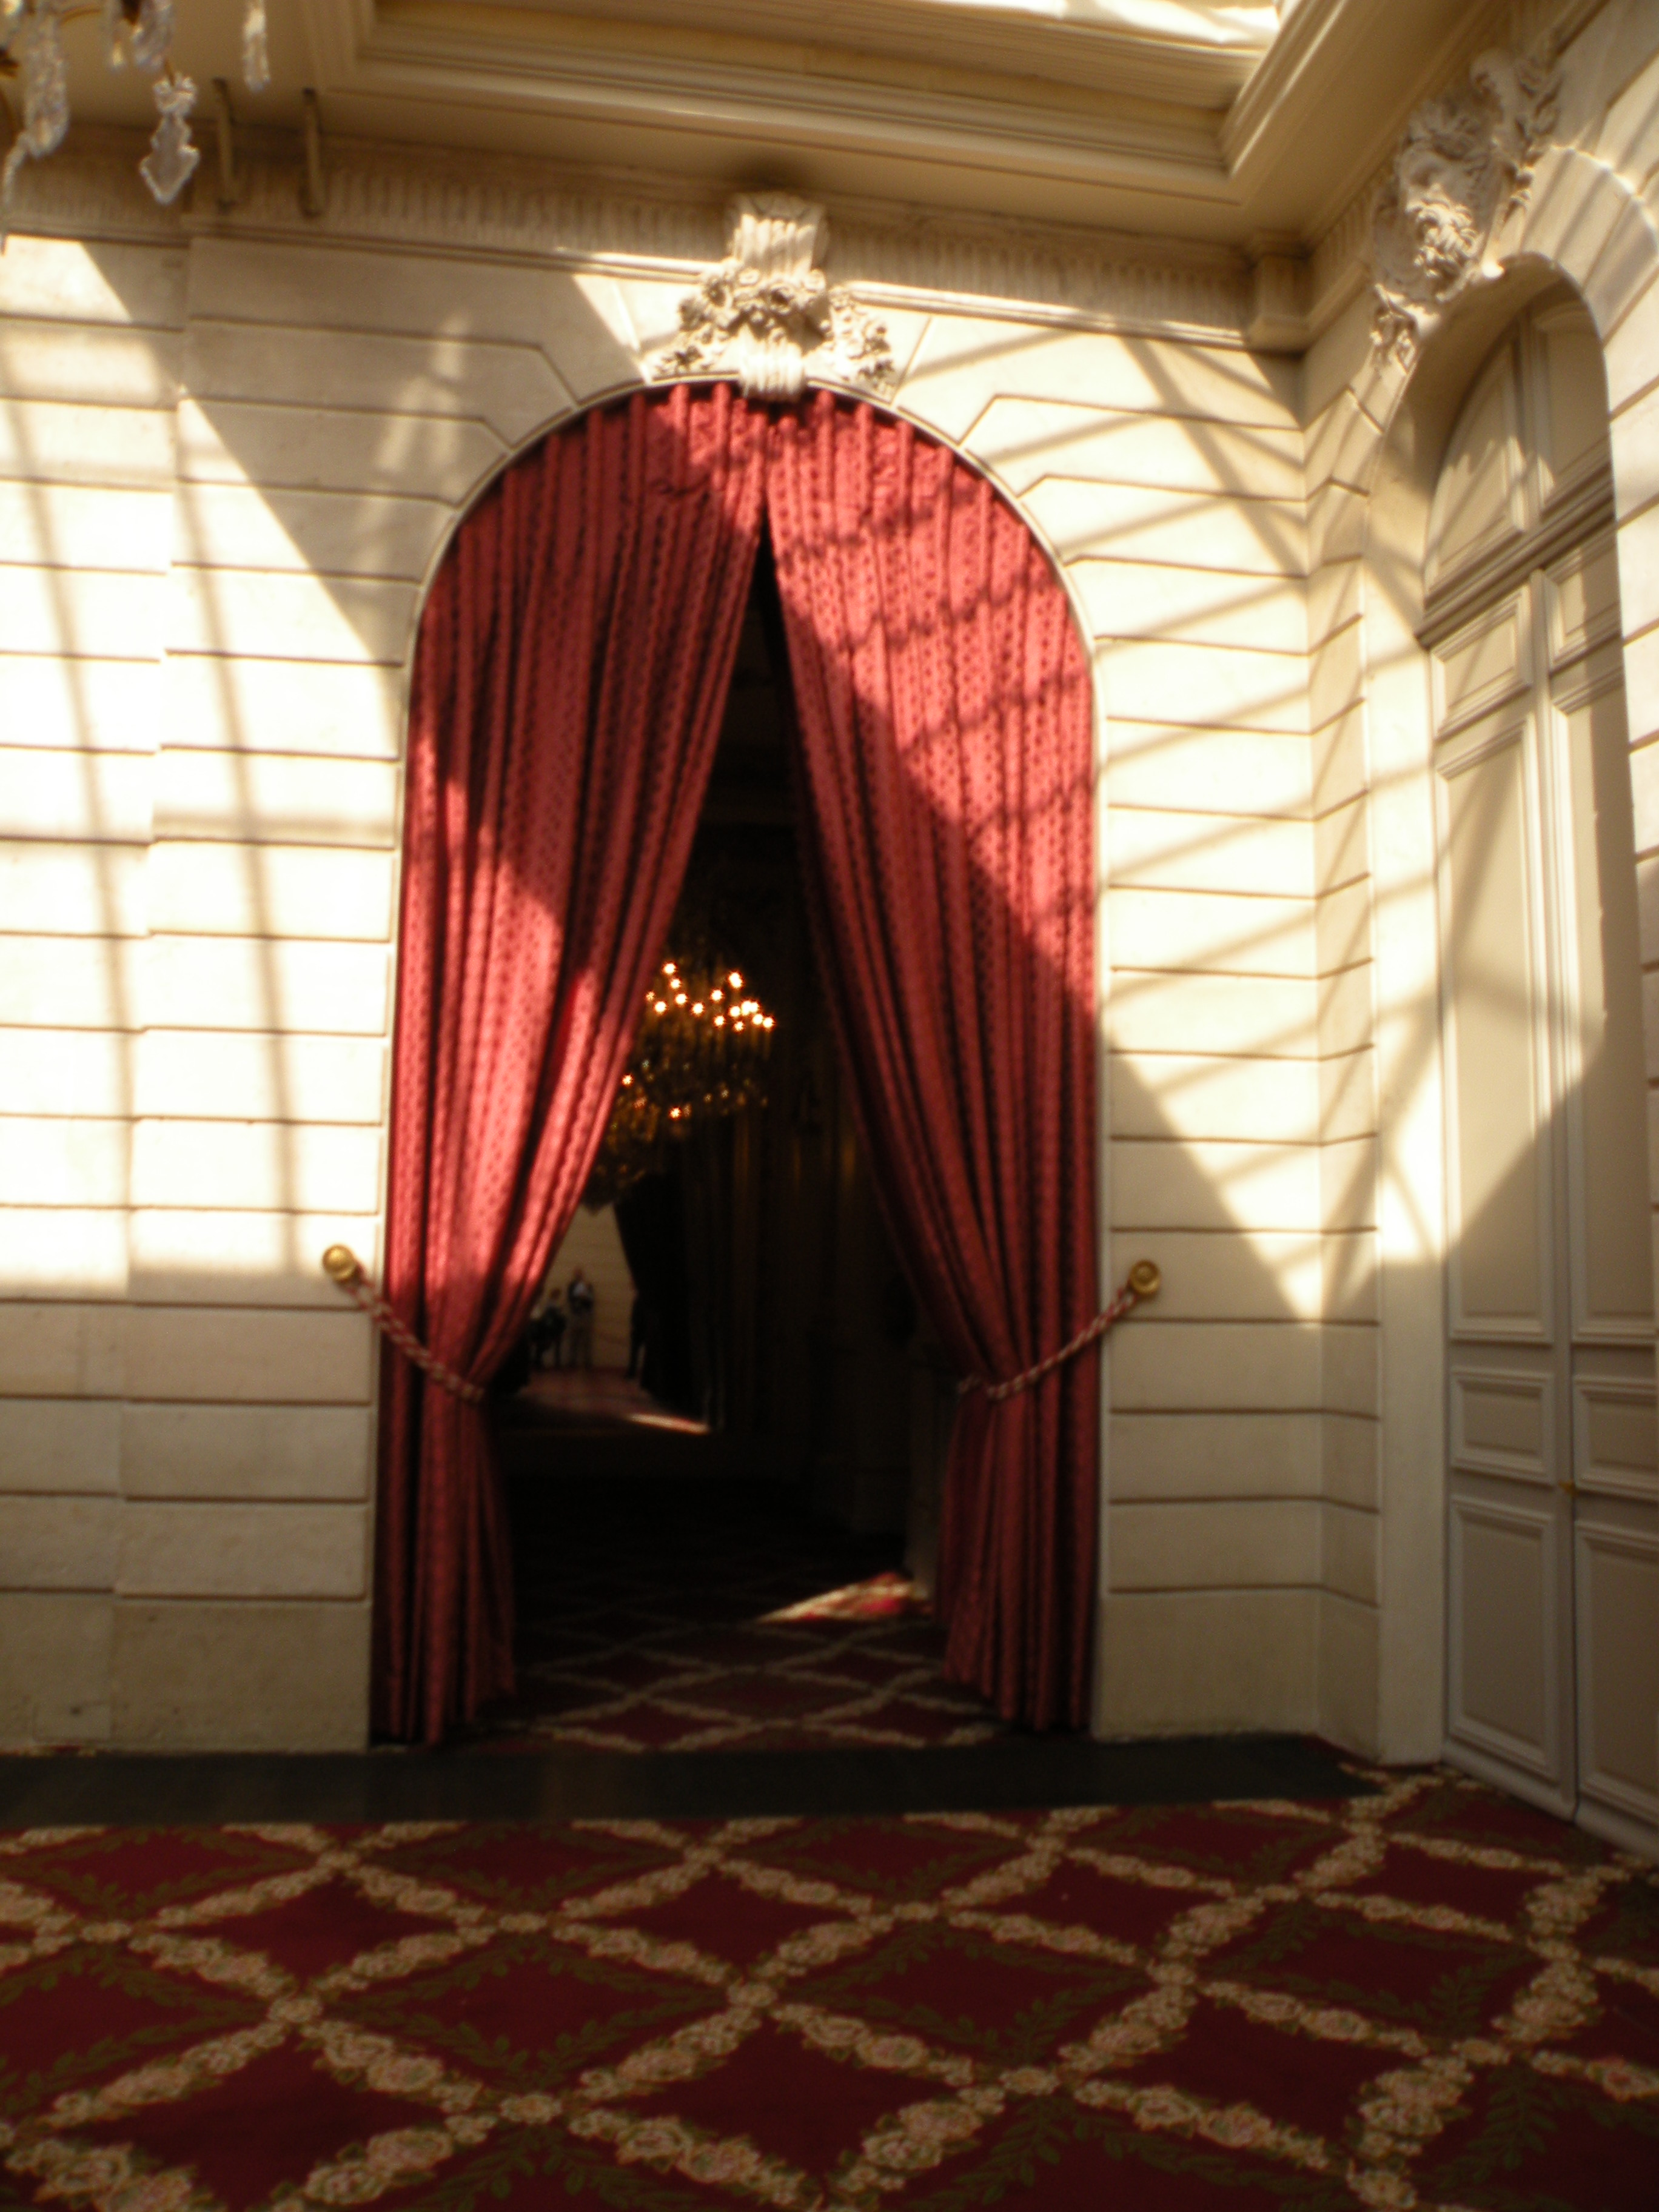 File:Porte jardin d\'hiver elysee.JPG - Wikimedia Commons